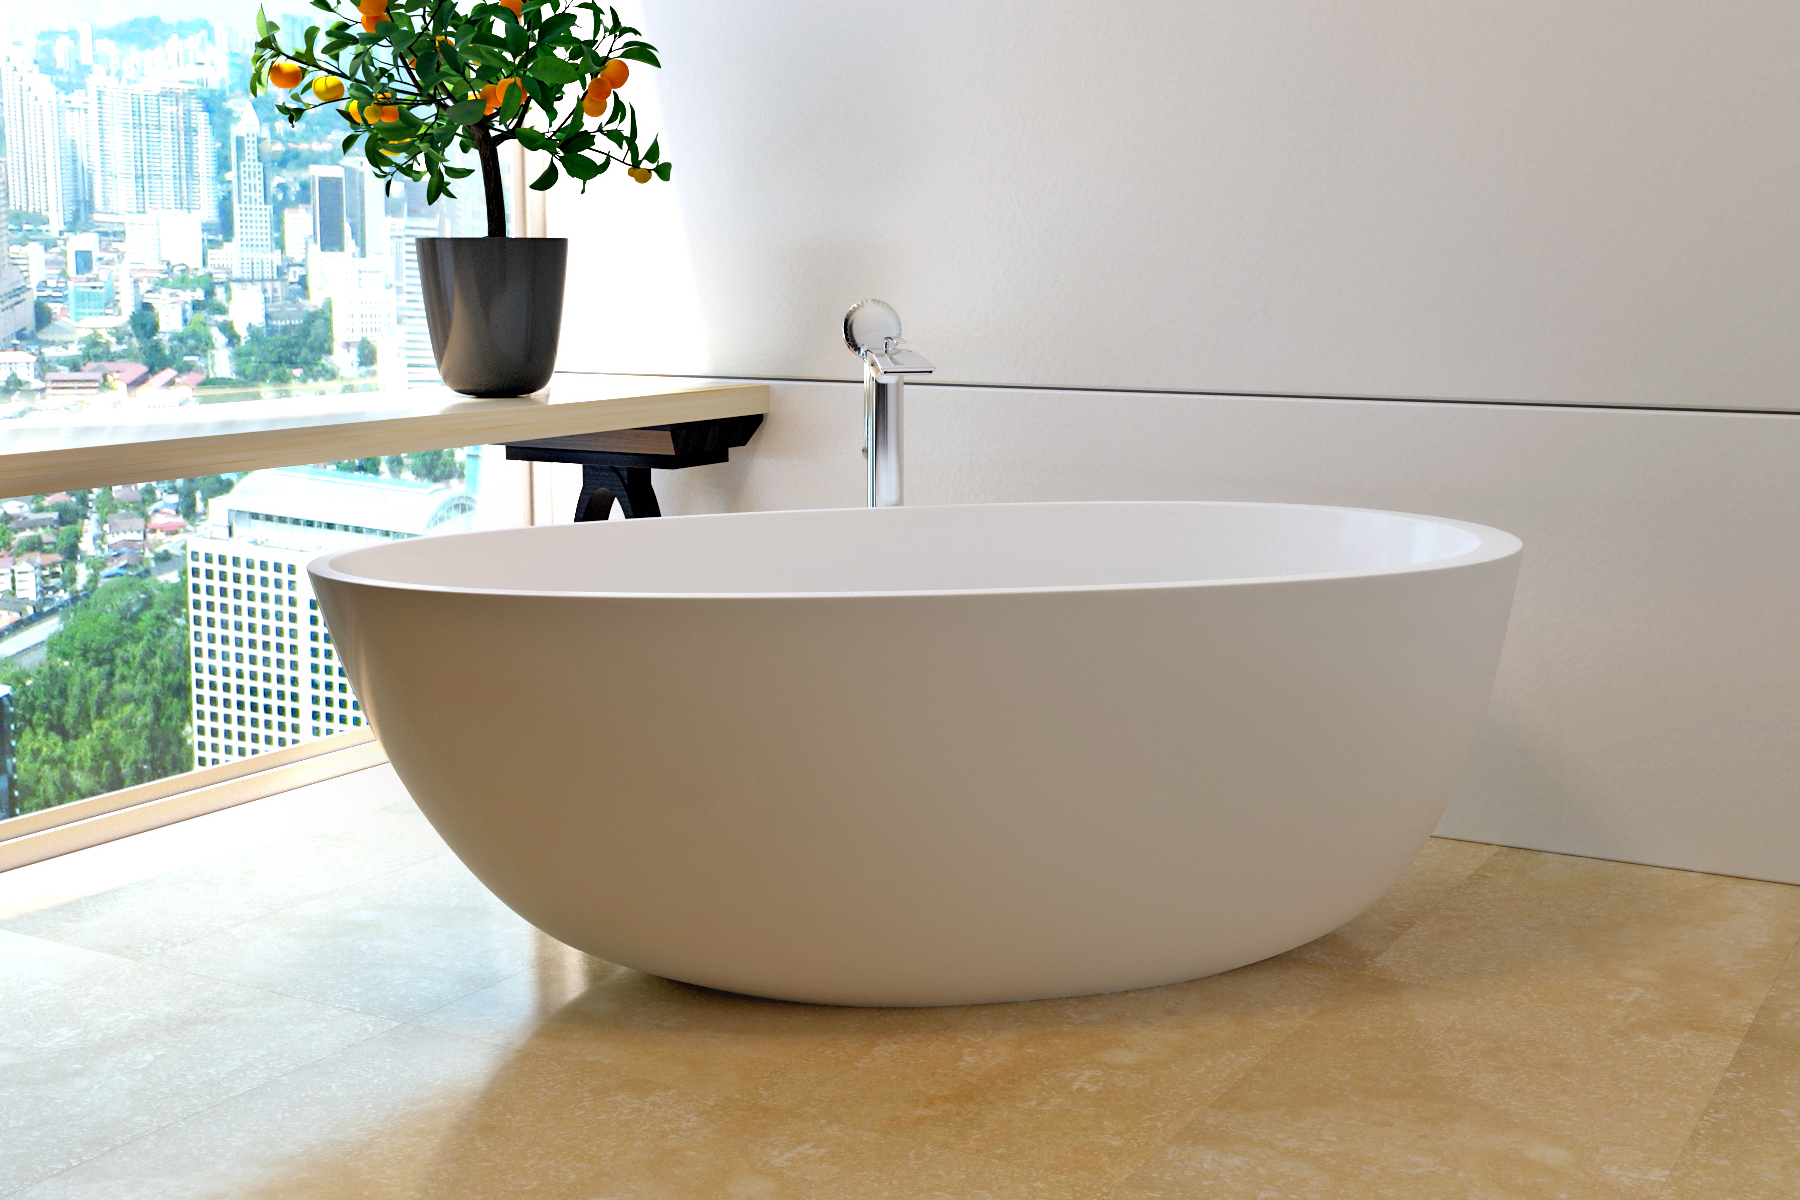 Beau Aquatica Spoon 2 (Purescape 204AM) Egg Shaped Freestanding Solid Surface  Bathtub